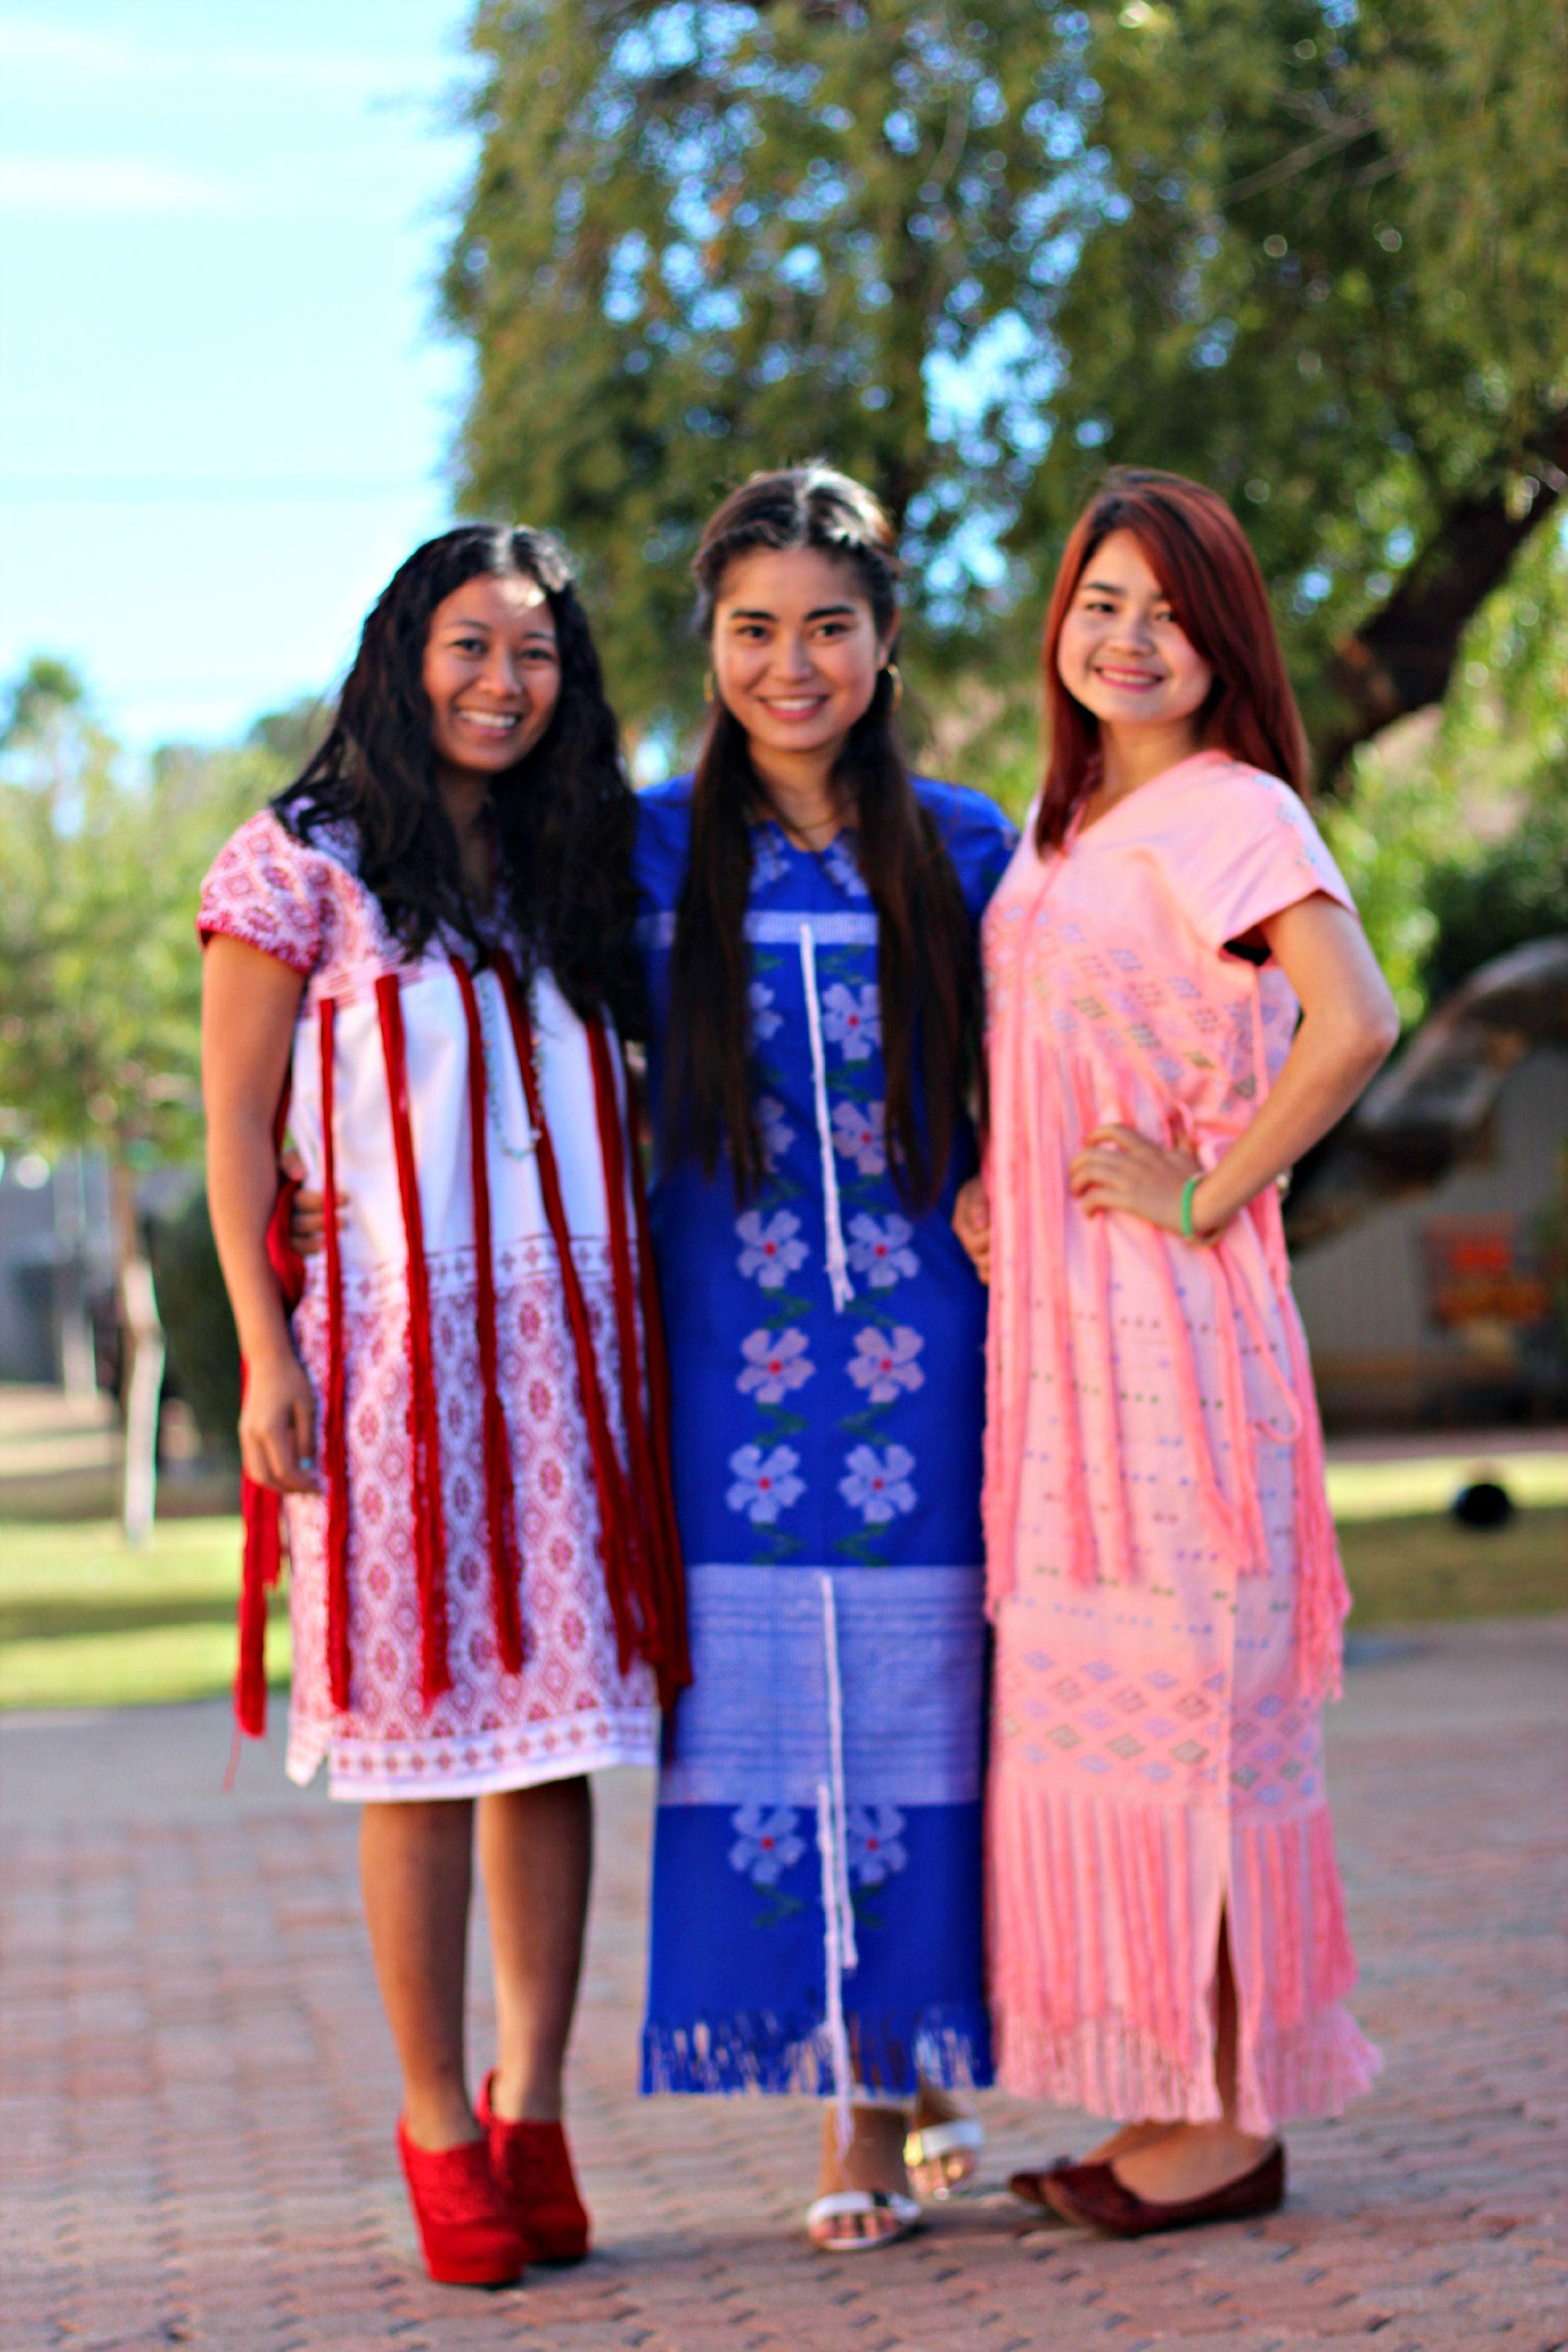 Karen Tribe Wedding Dress Weaved